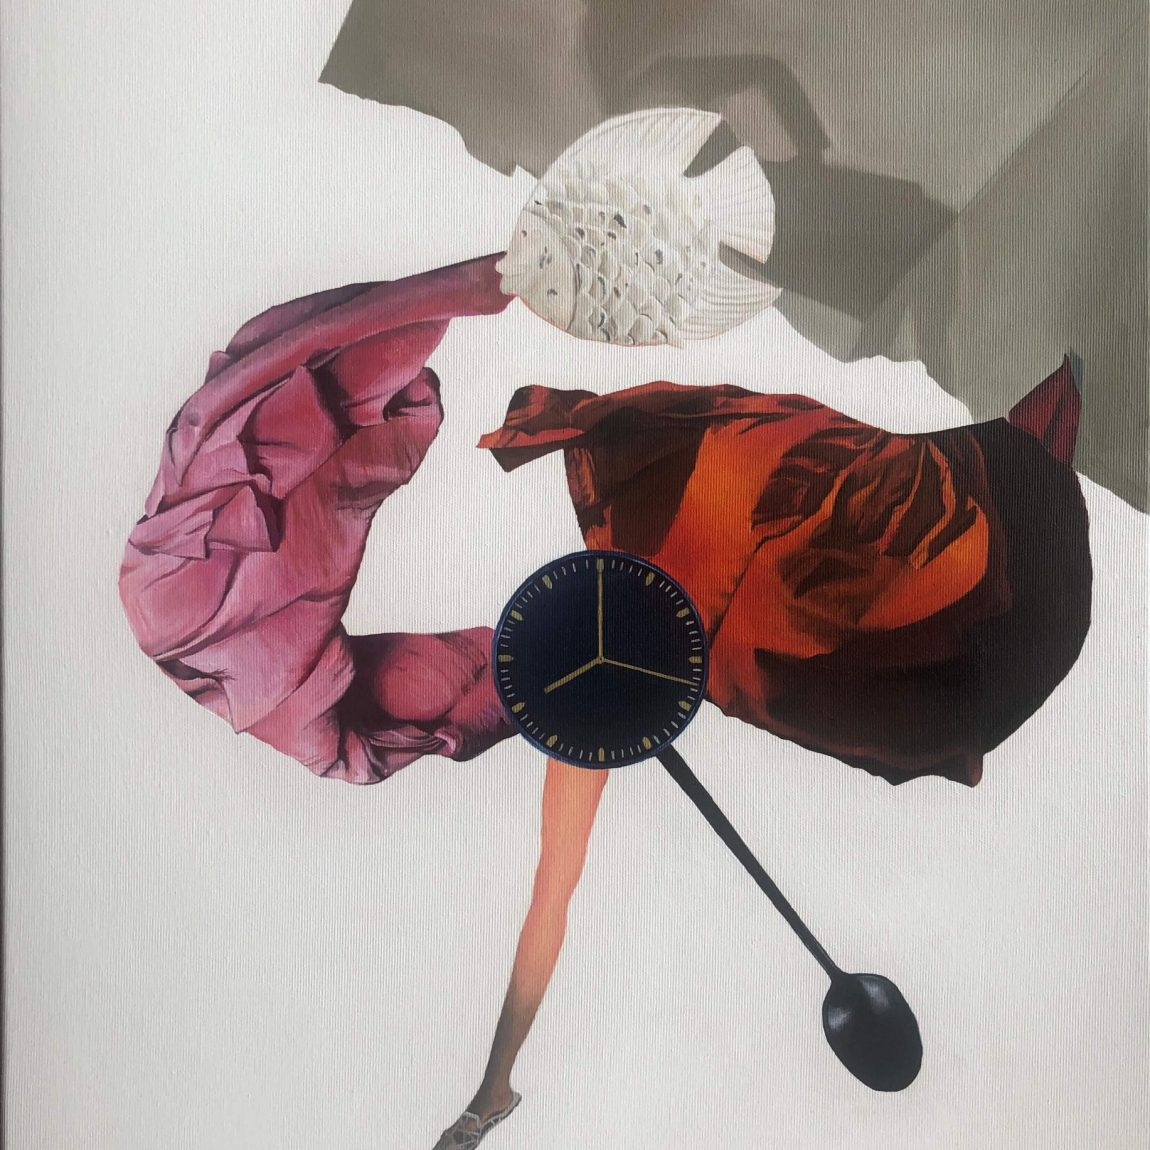 Melis Korkmaz - Teknik: Tuval Üzeri Yağlı Boya - Ölçü : 50 x 70 cm - Fİyat : 10.700 TL